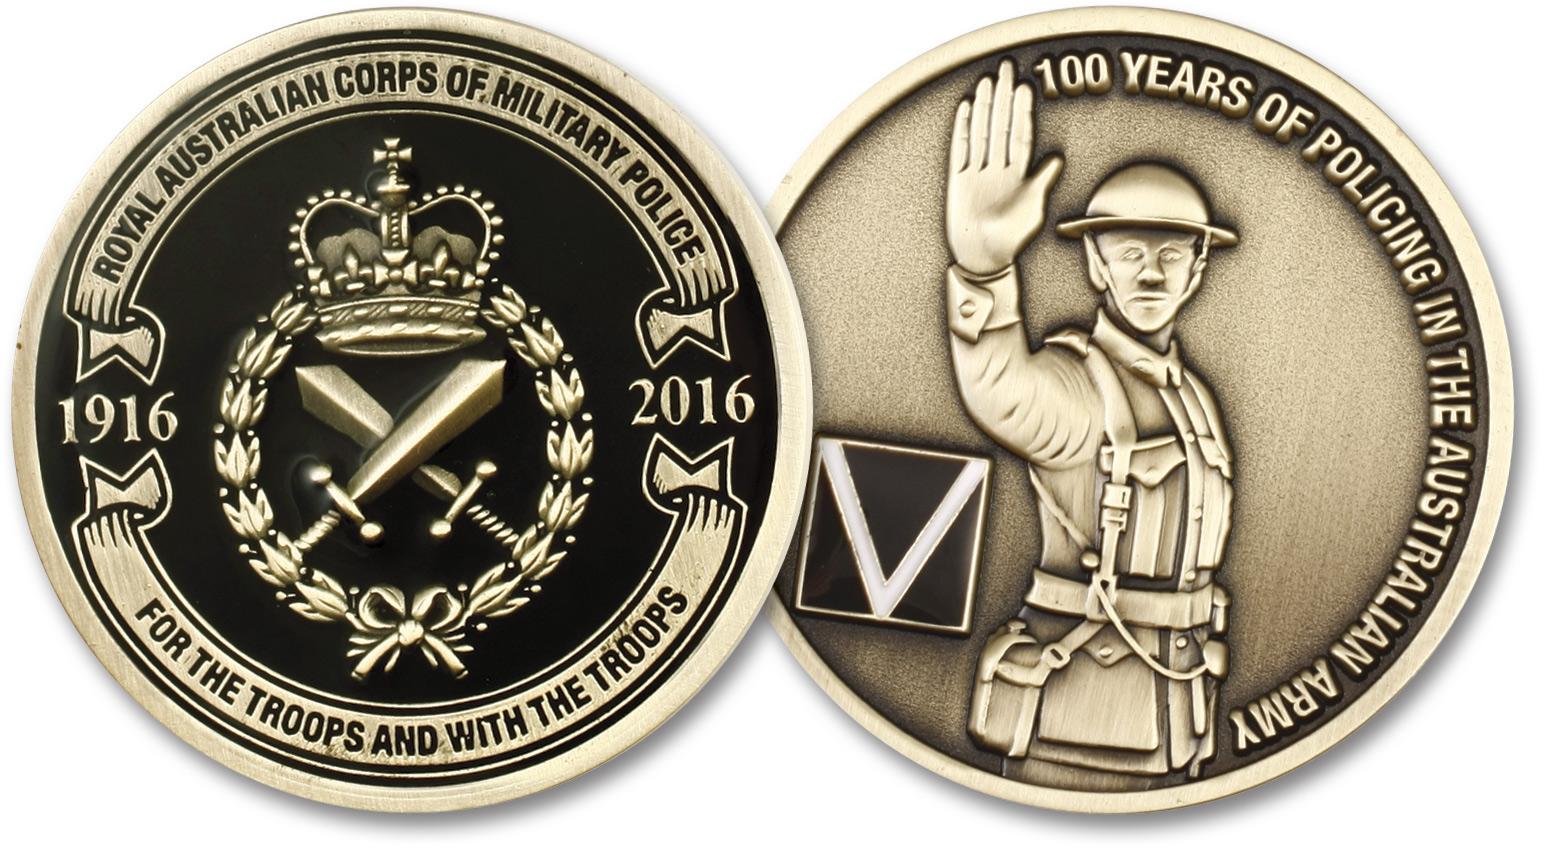 Royal Australian Corps of Military Police Lapel Pin Badge Gift Australia